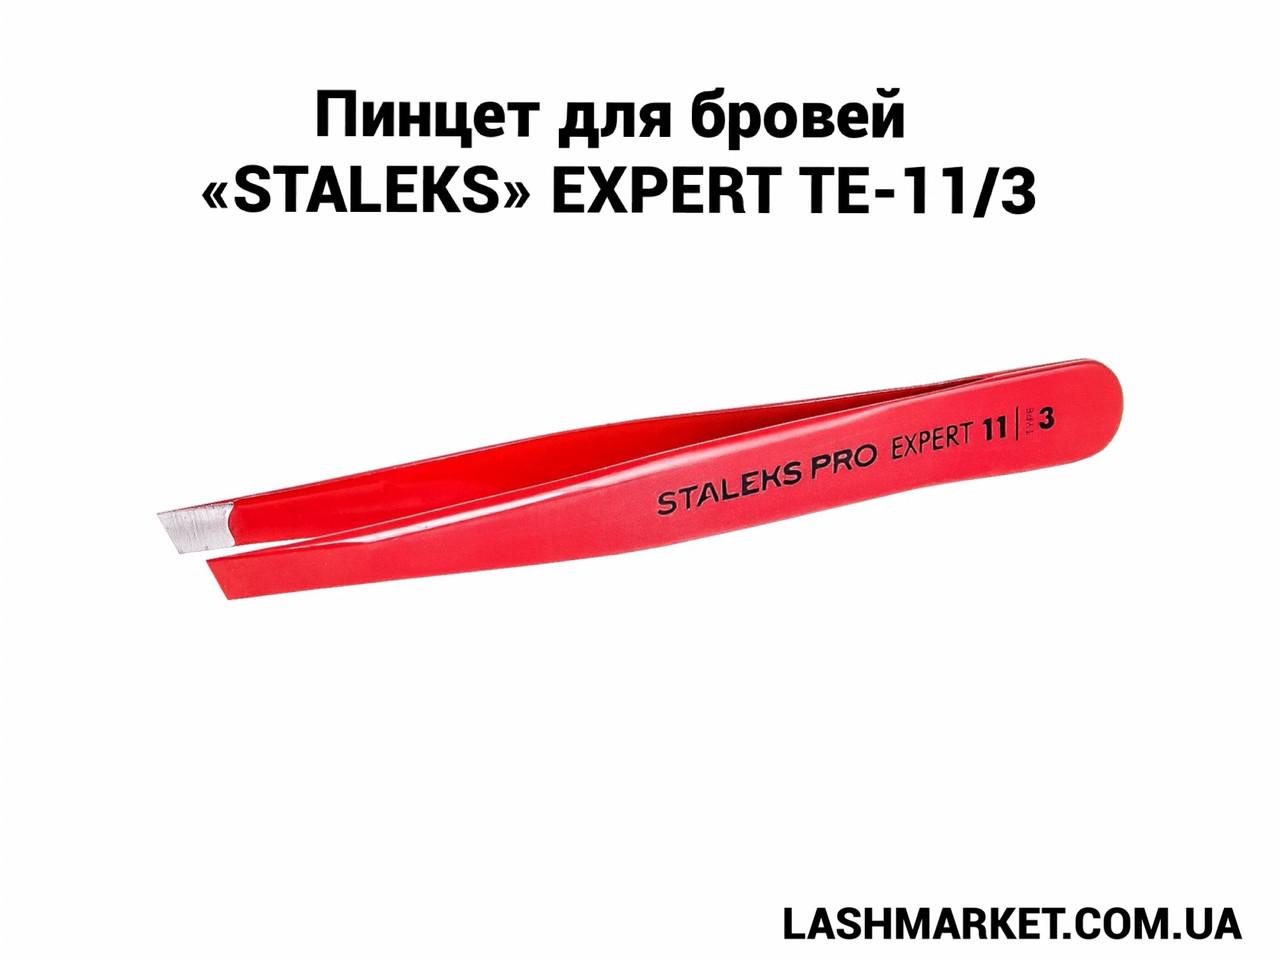 Пинцет для бровей «STALEKS» Expert TE-11/3, красный